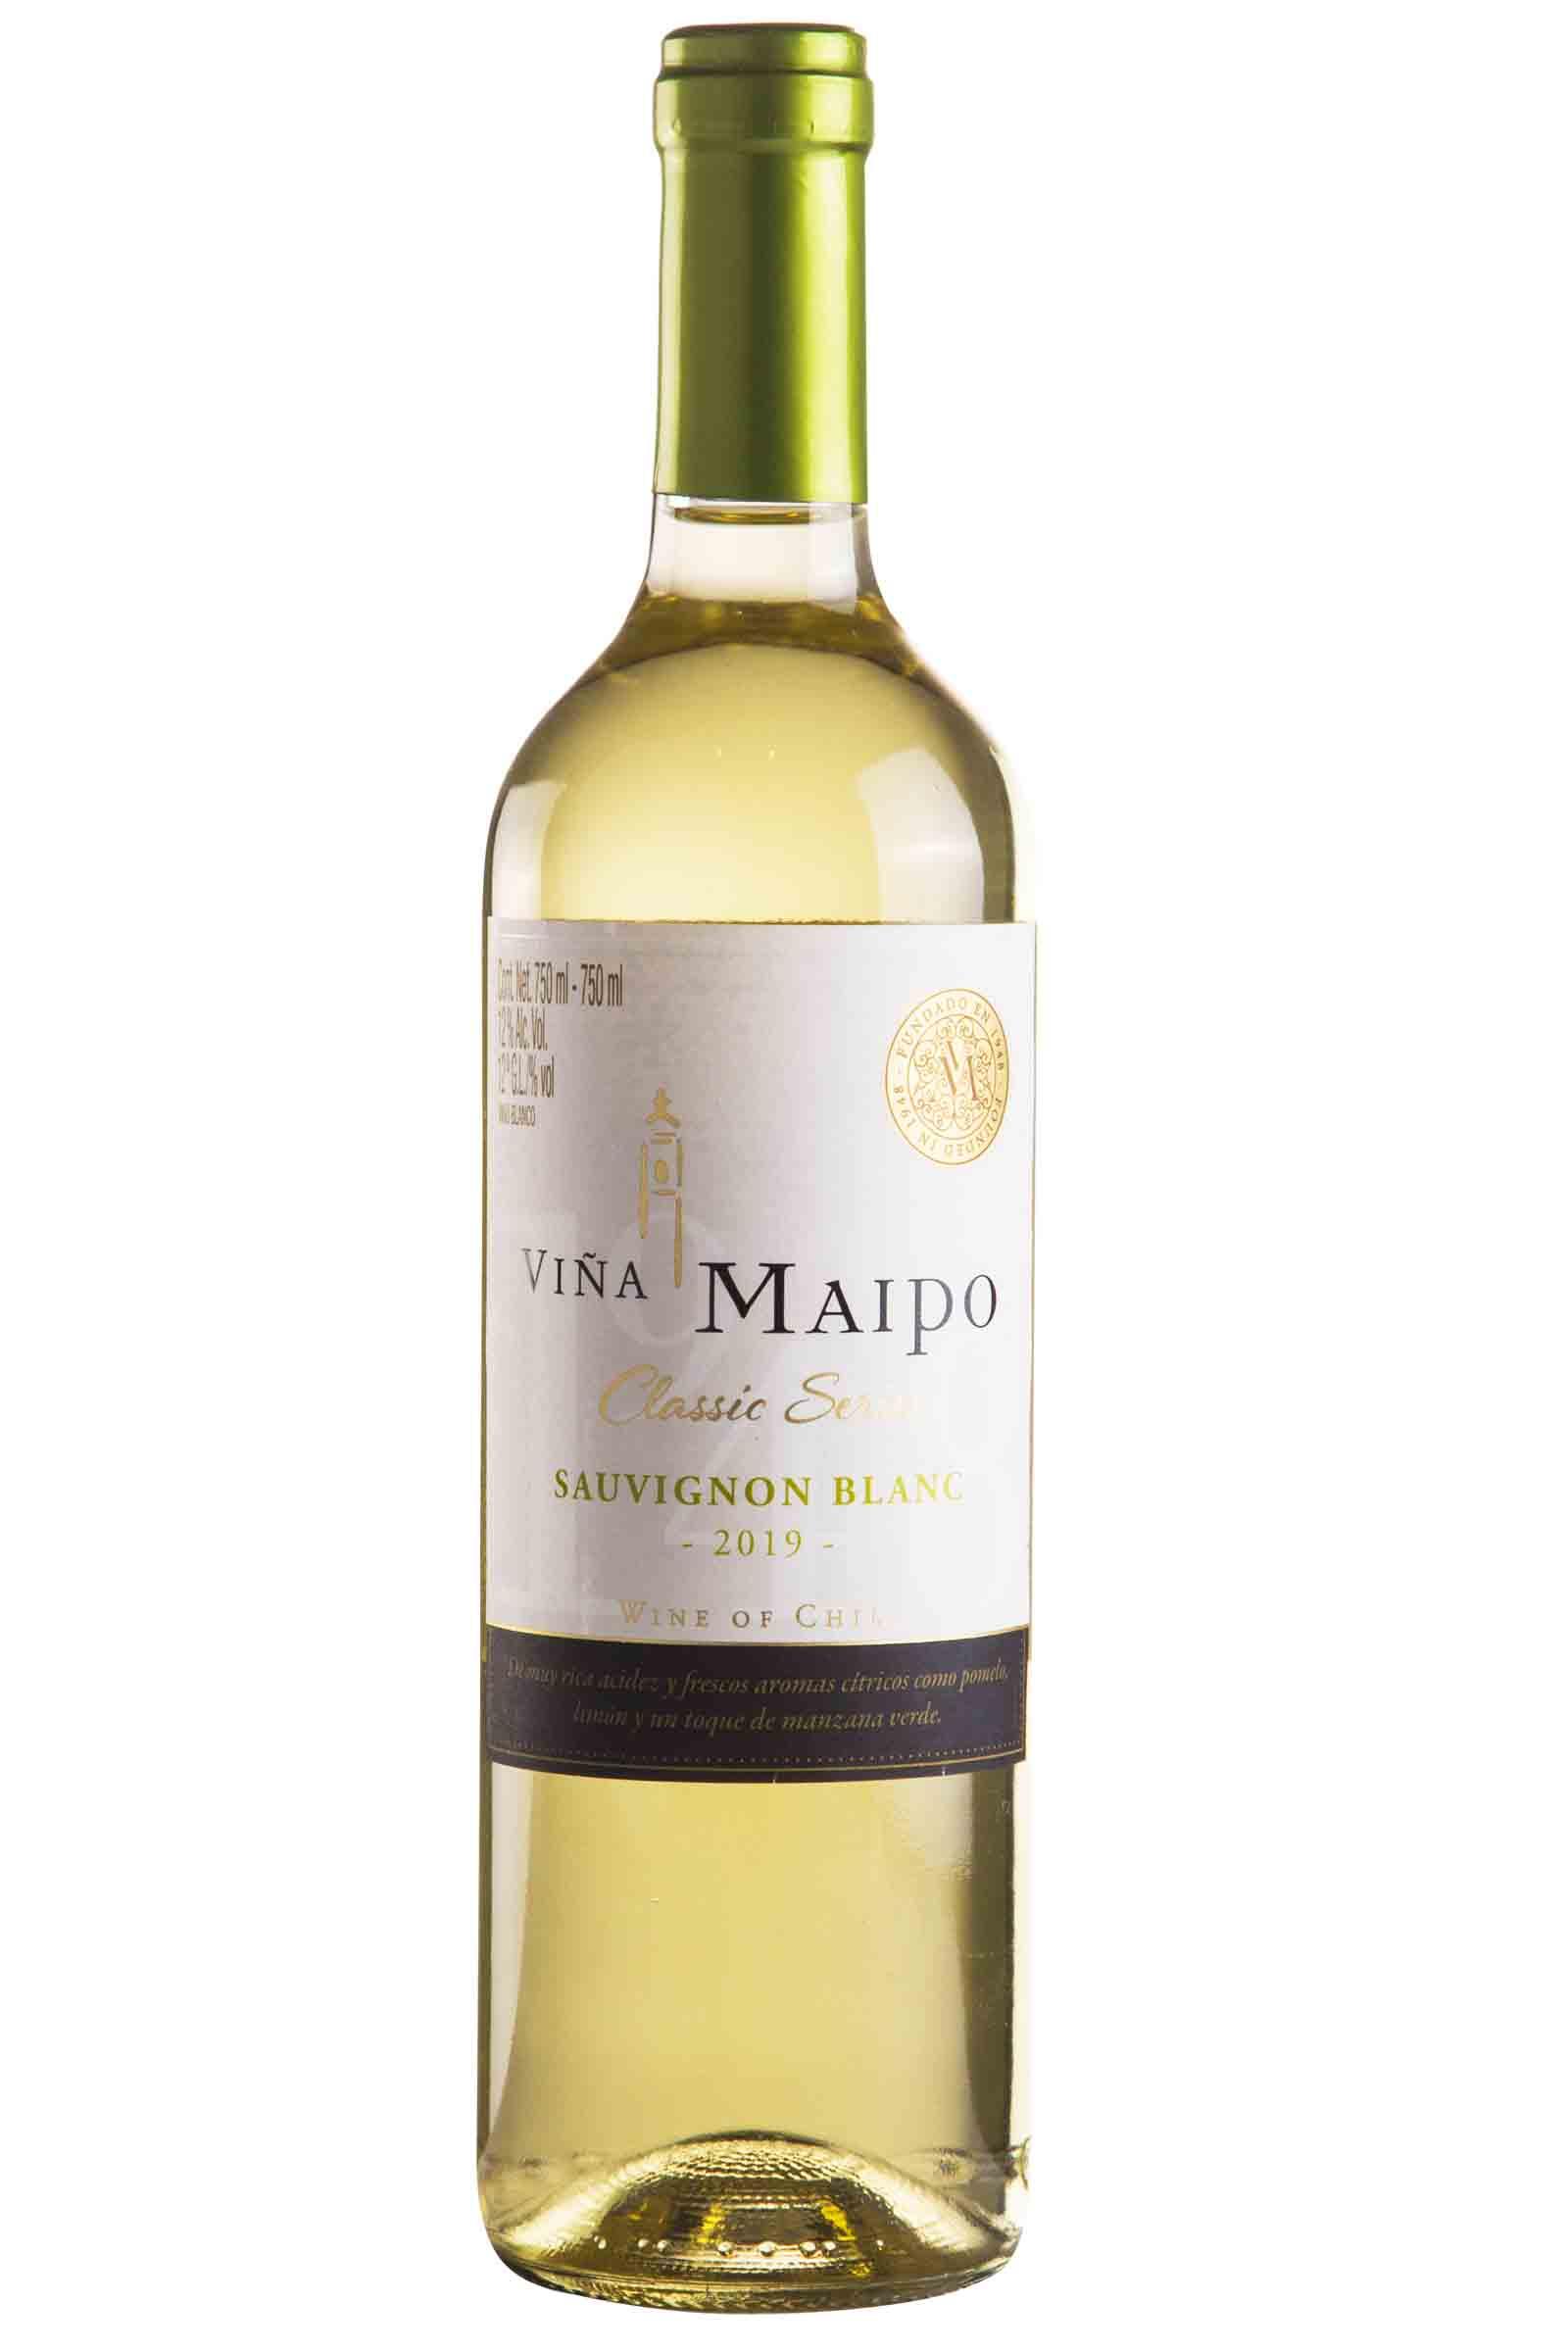 Vino Maipo Varietal Sauvignon Blanc 750ml